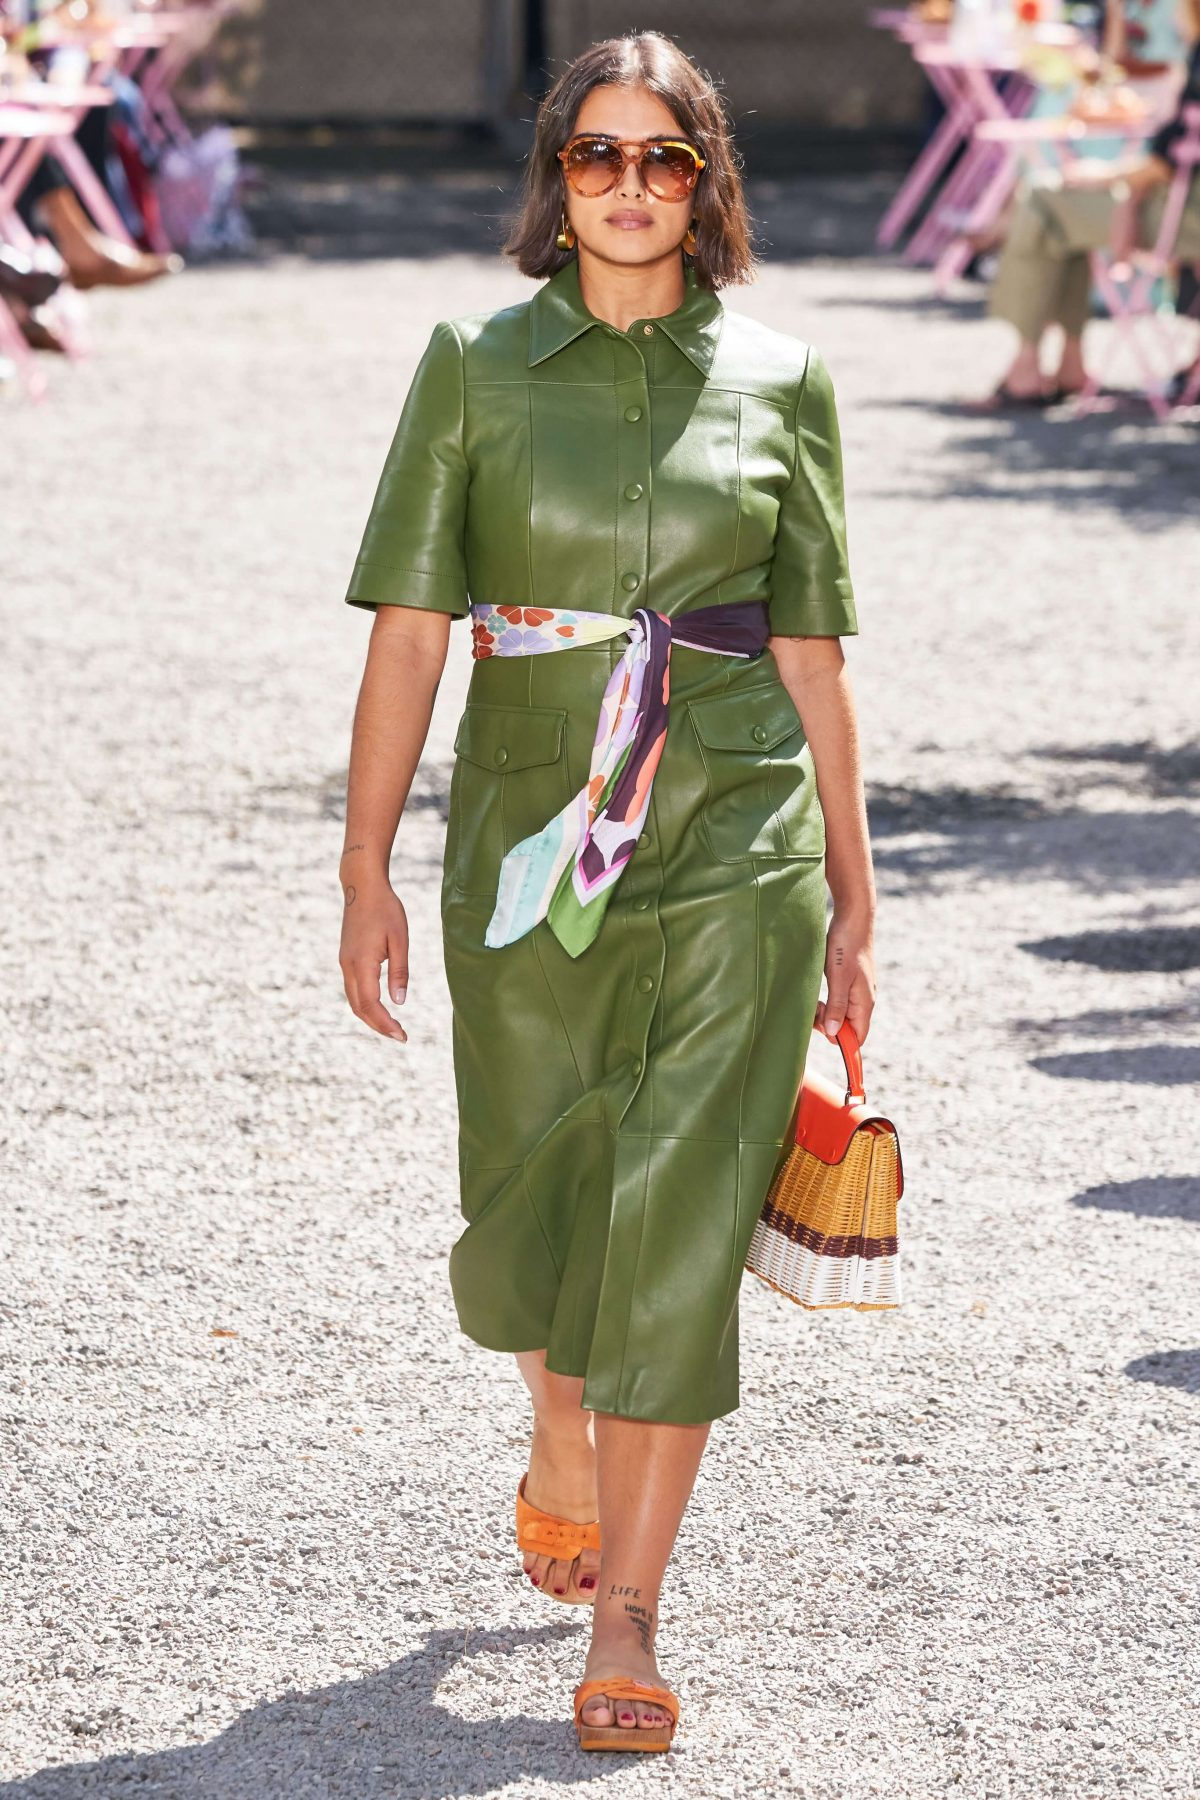 Kate Spade green leather dress.